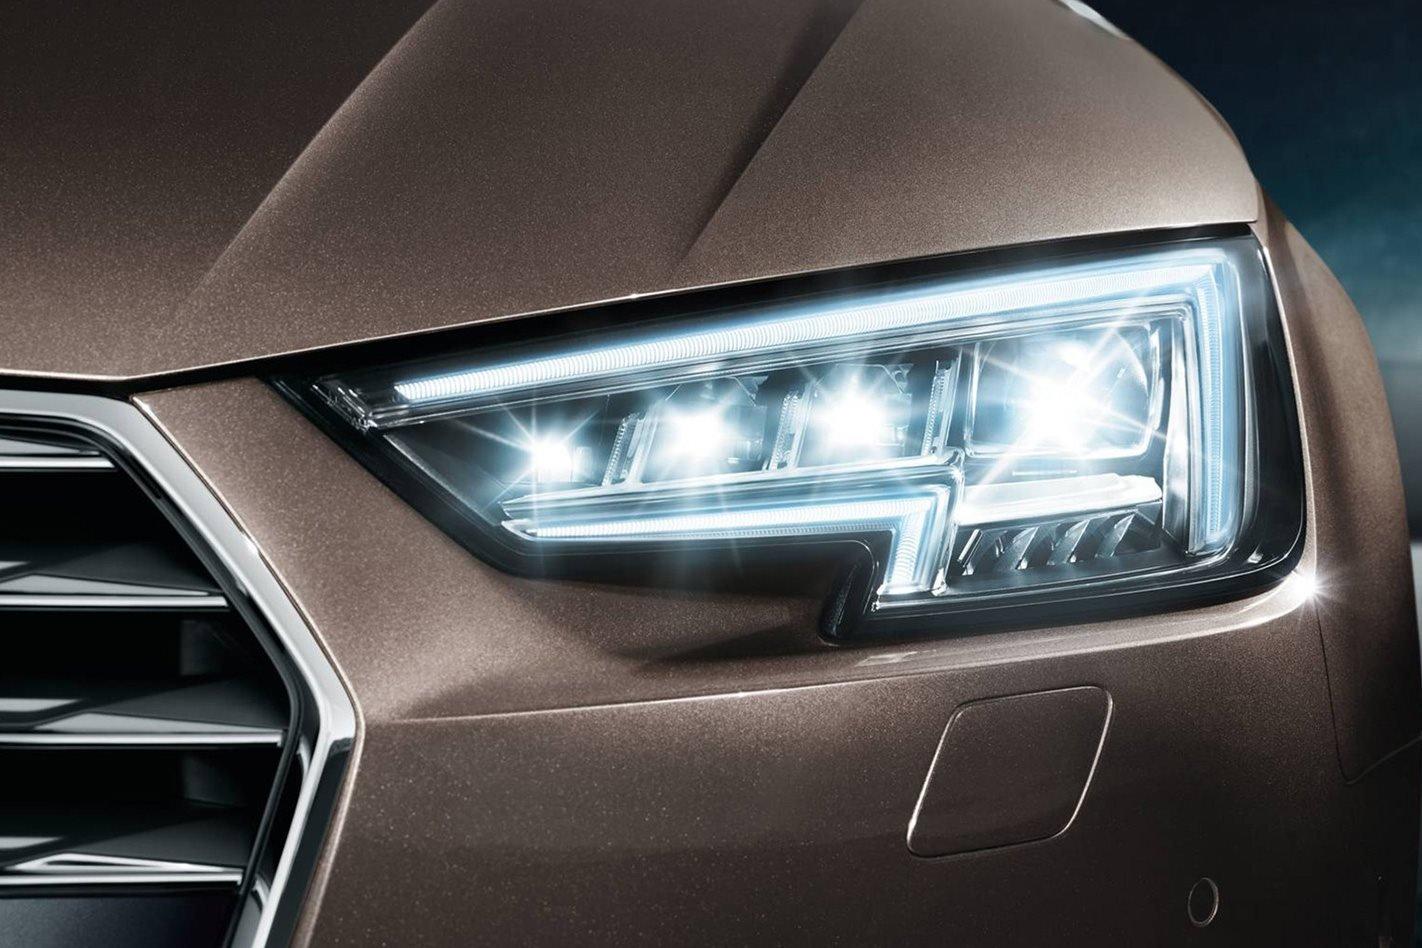 Đèn matrix LED trên xe Audi.